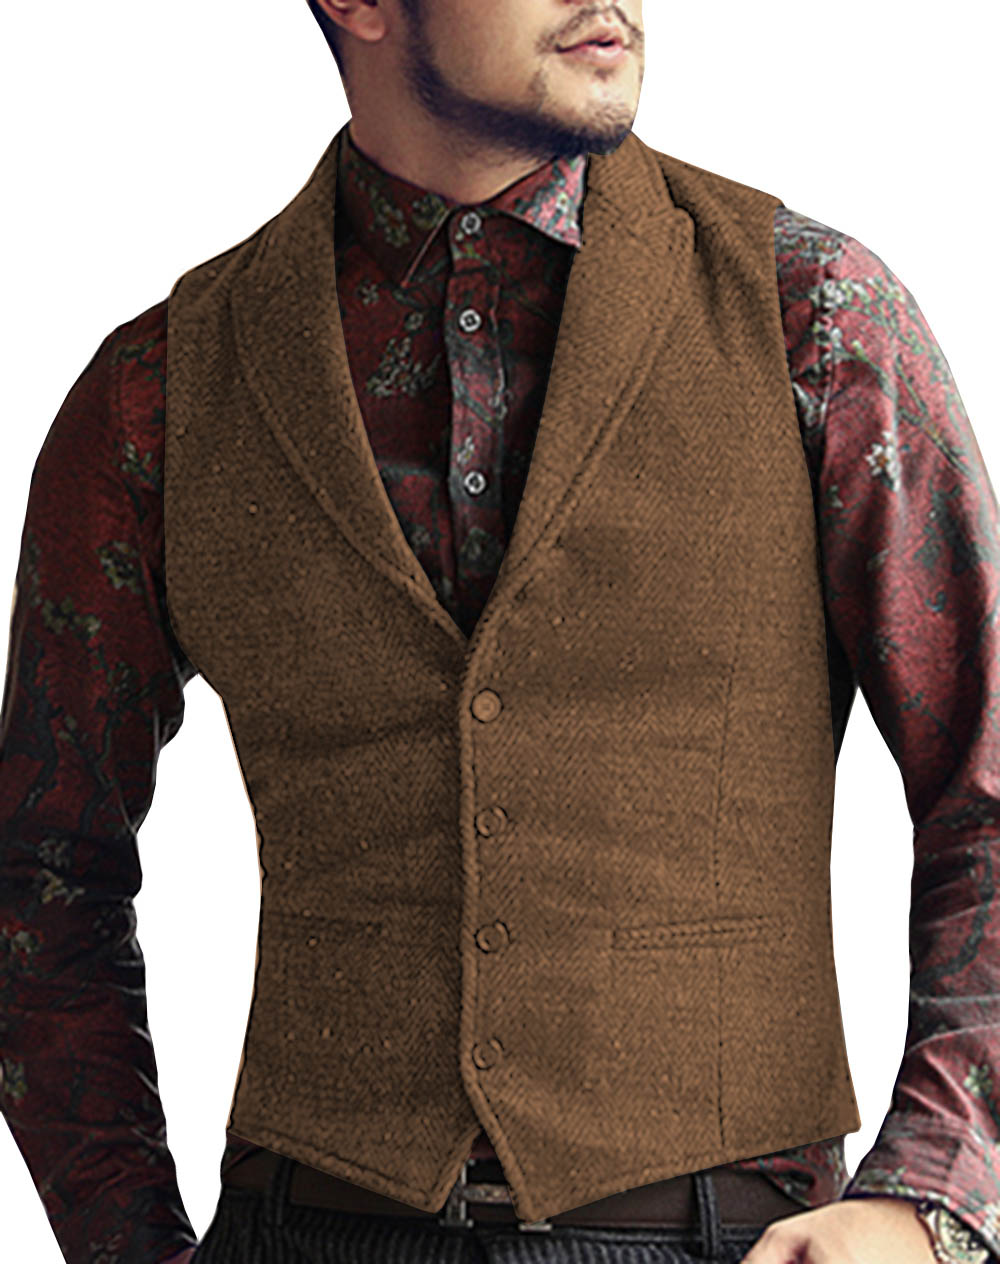 Mens-Suit-Vest-Lapel-V-Neck-Wool-Herringbone-Casual-Formal-Business-Vest-Waistcoat-Groomman-For-Wedding (5)